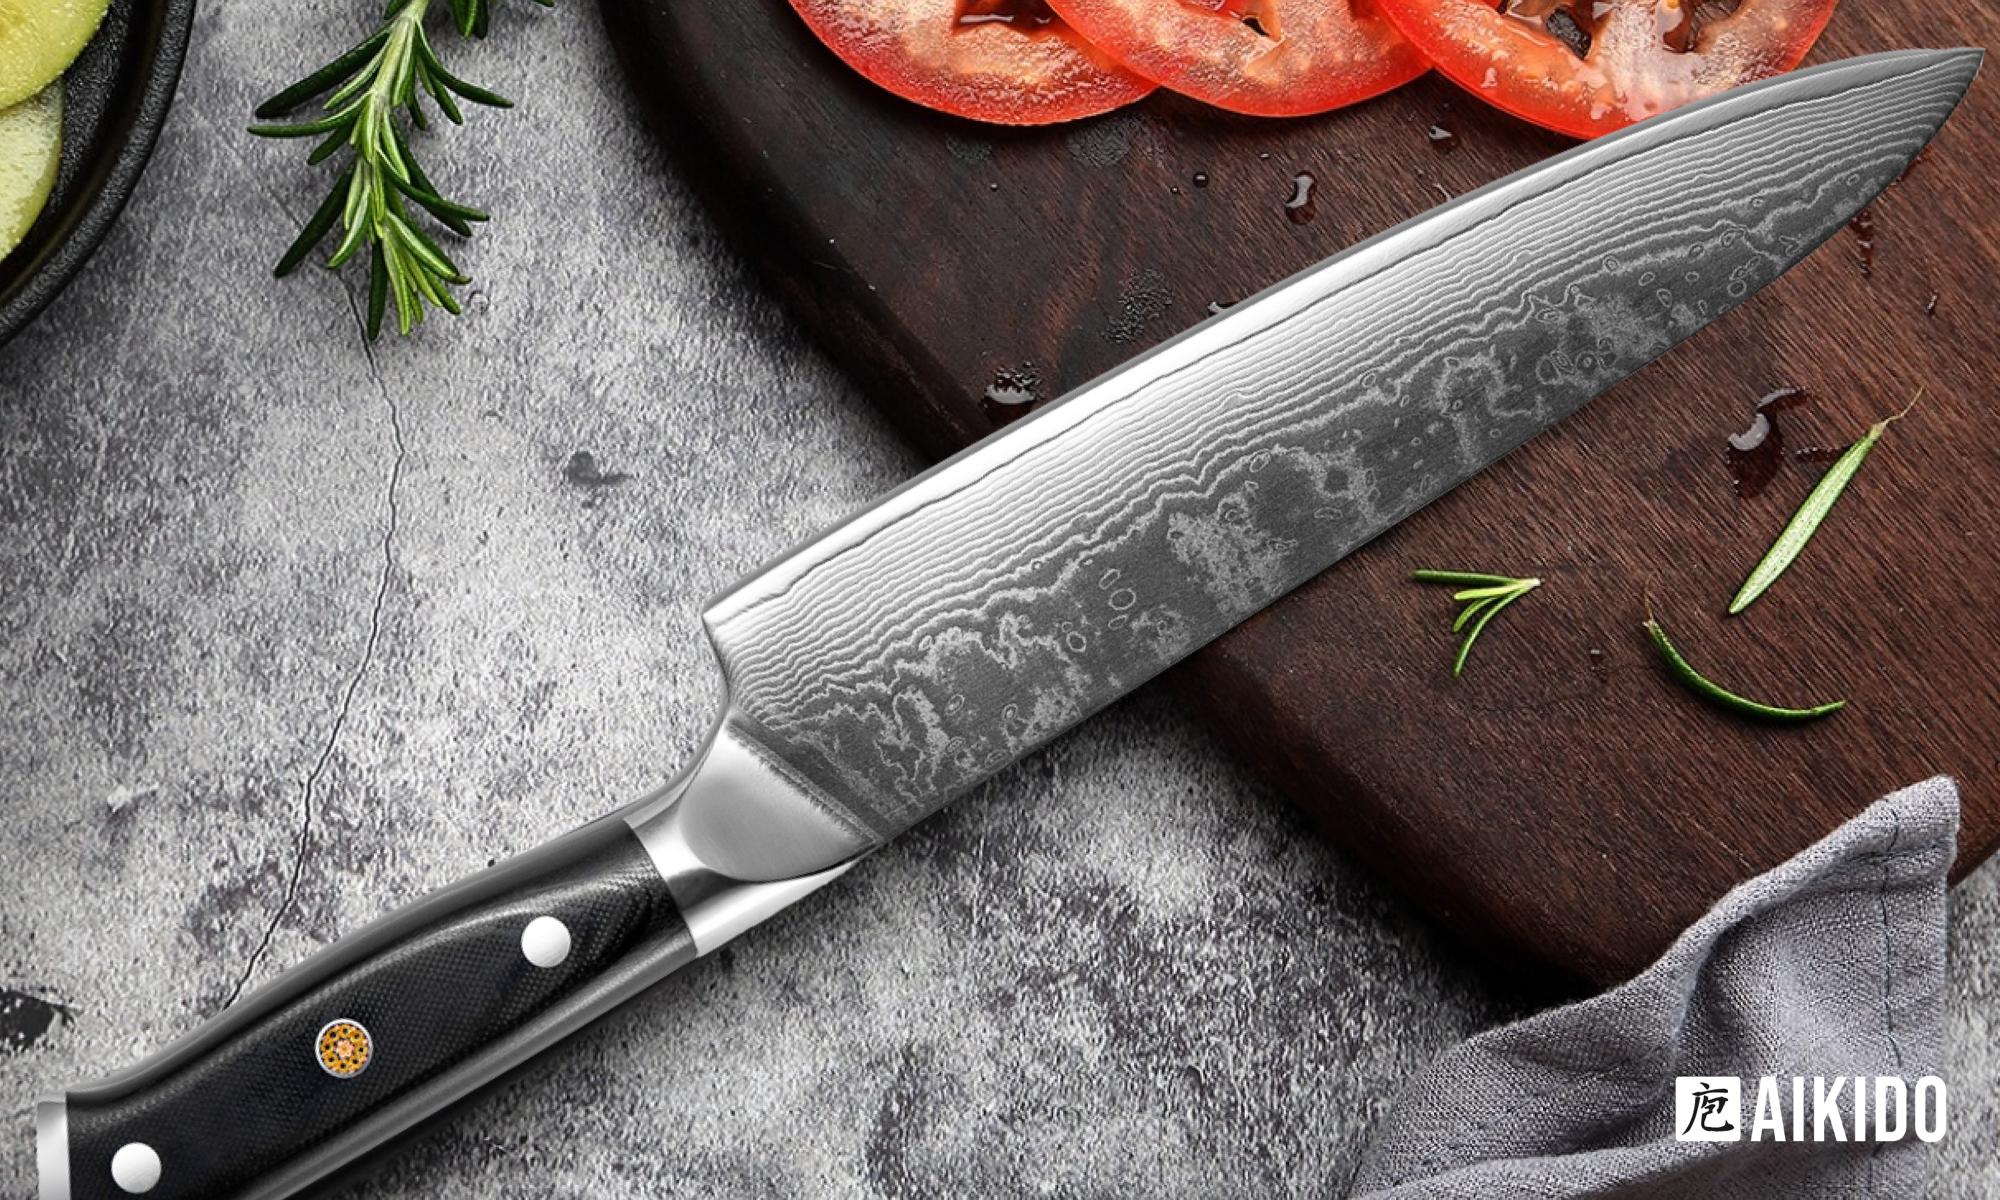 Kurashikku 8 Chef Knife Knife Design Chef Knife High Quality Kitchen